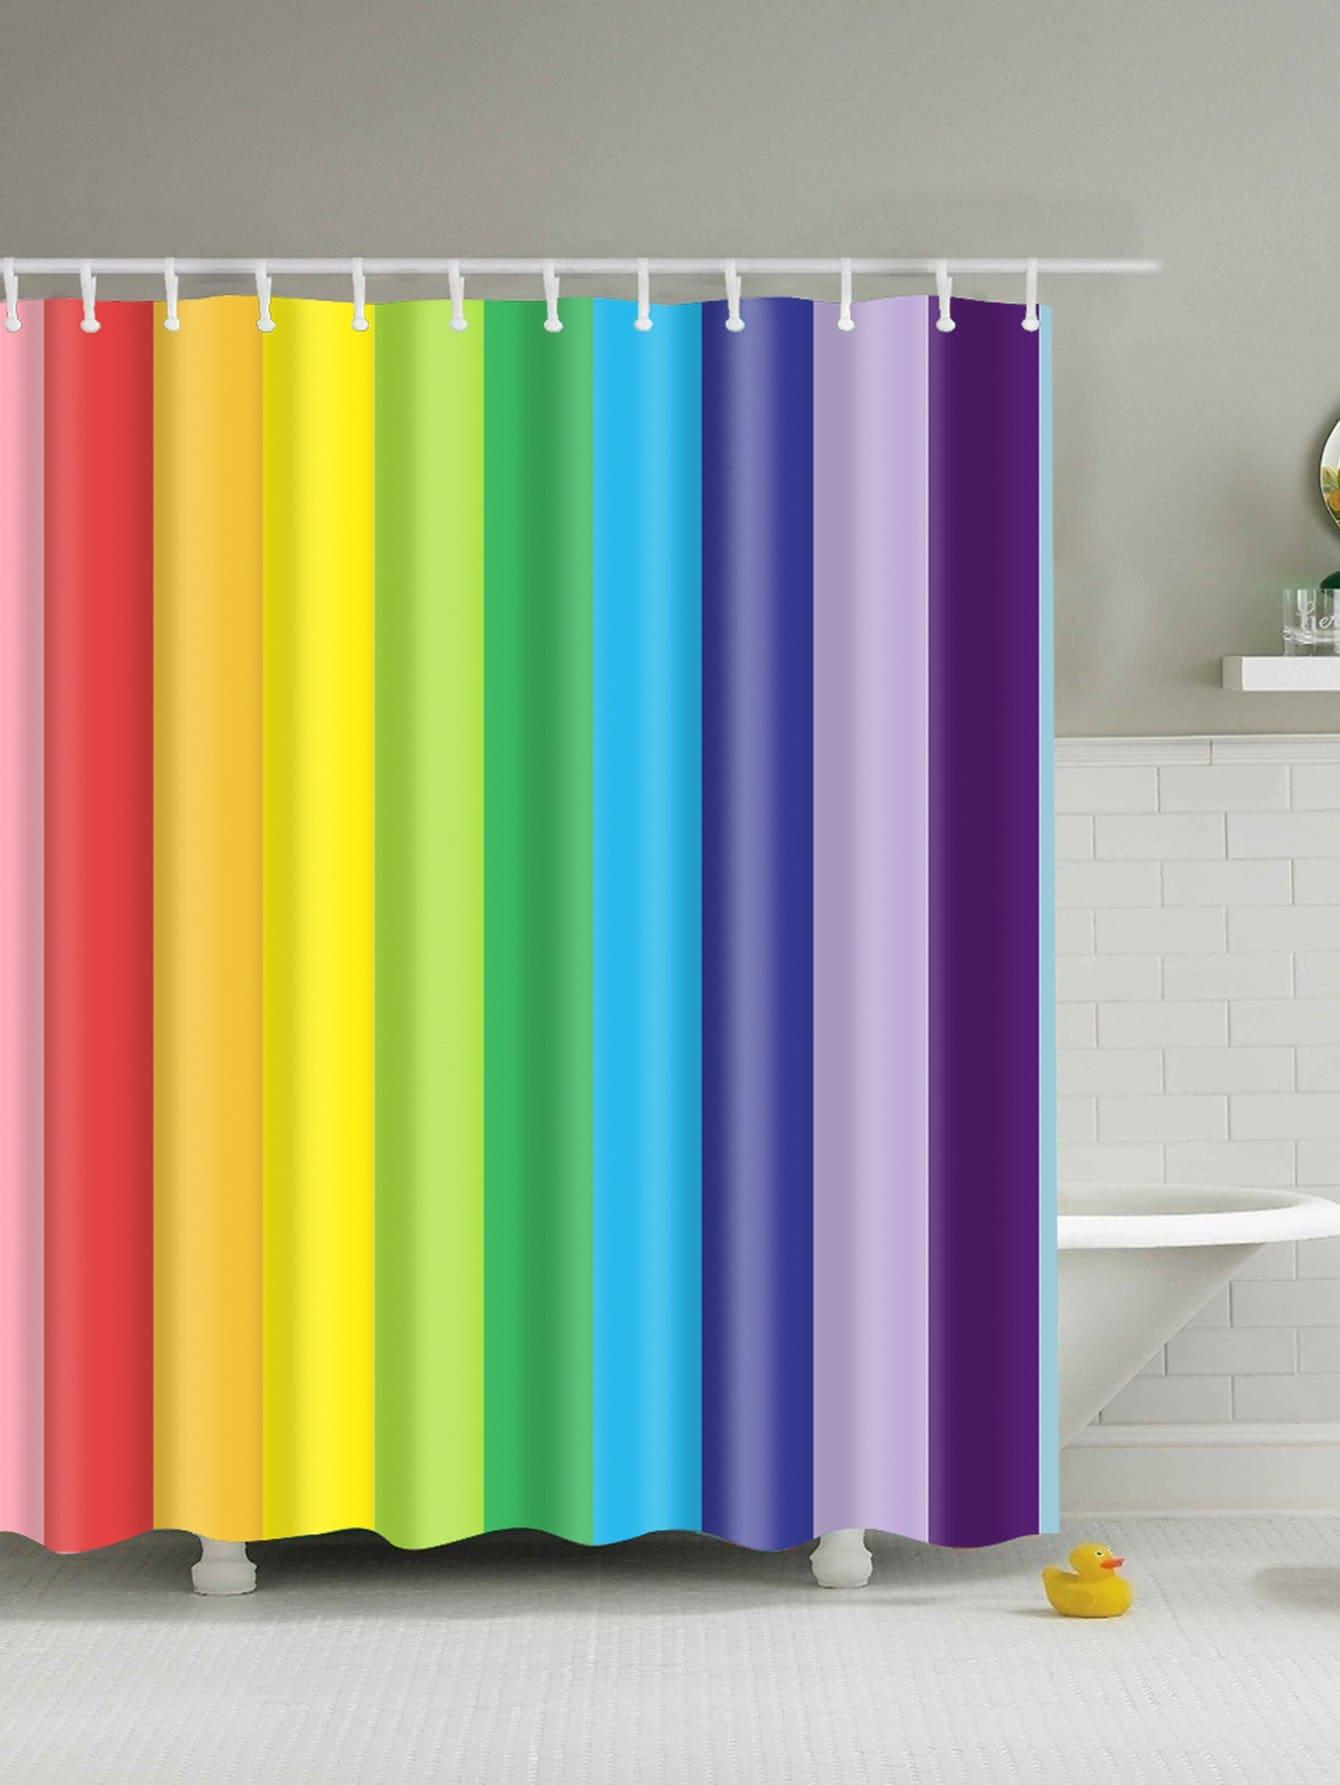 Купить Занавес для душа Rainbow Stripe с крючком 12 шт., null, SheIn